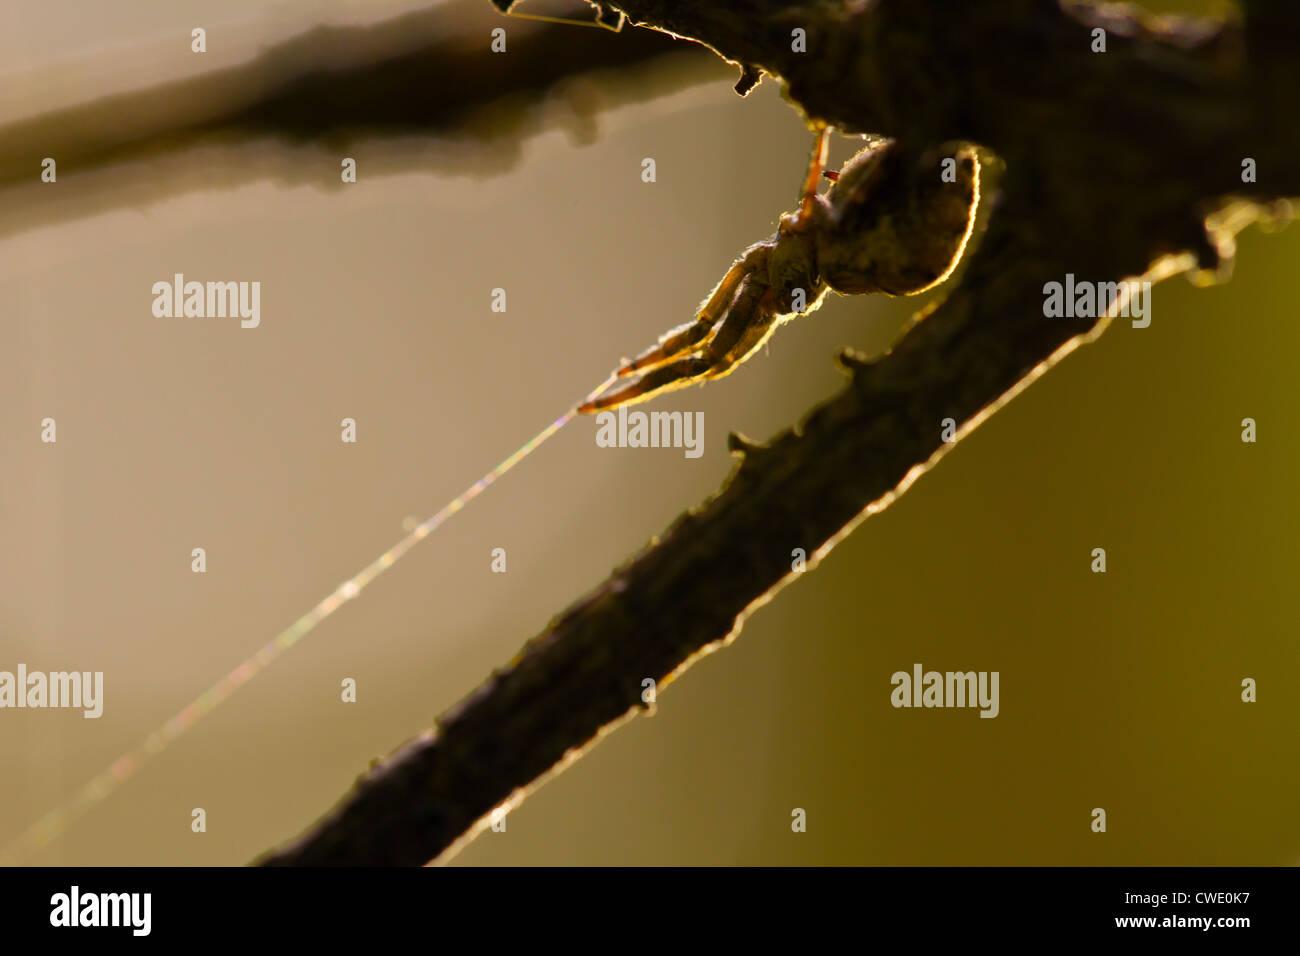 Hyptiotes paradoxus - the Triangle spider. One of few non-venomous European spiders. Part of the family Uloboridae. - Stock Image